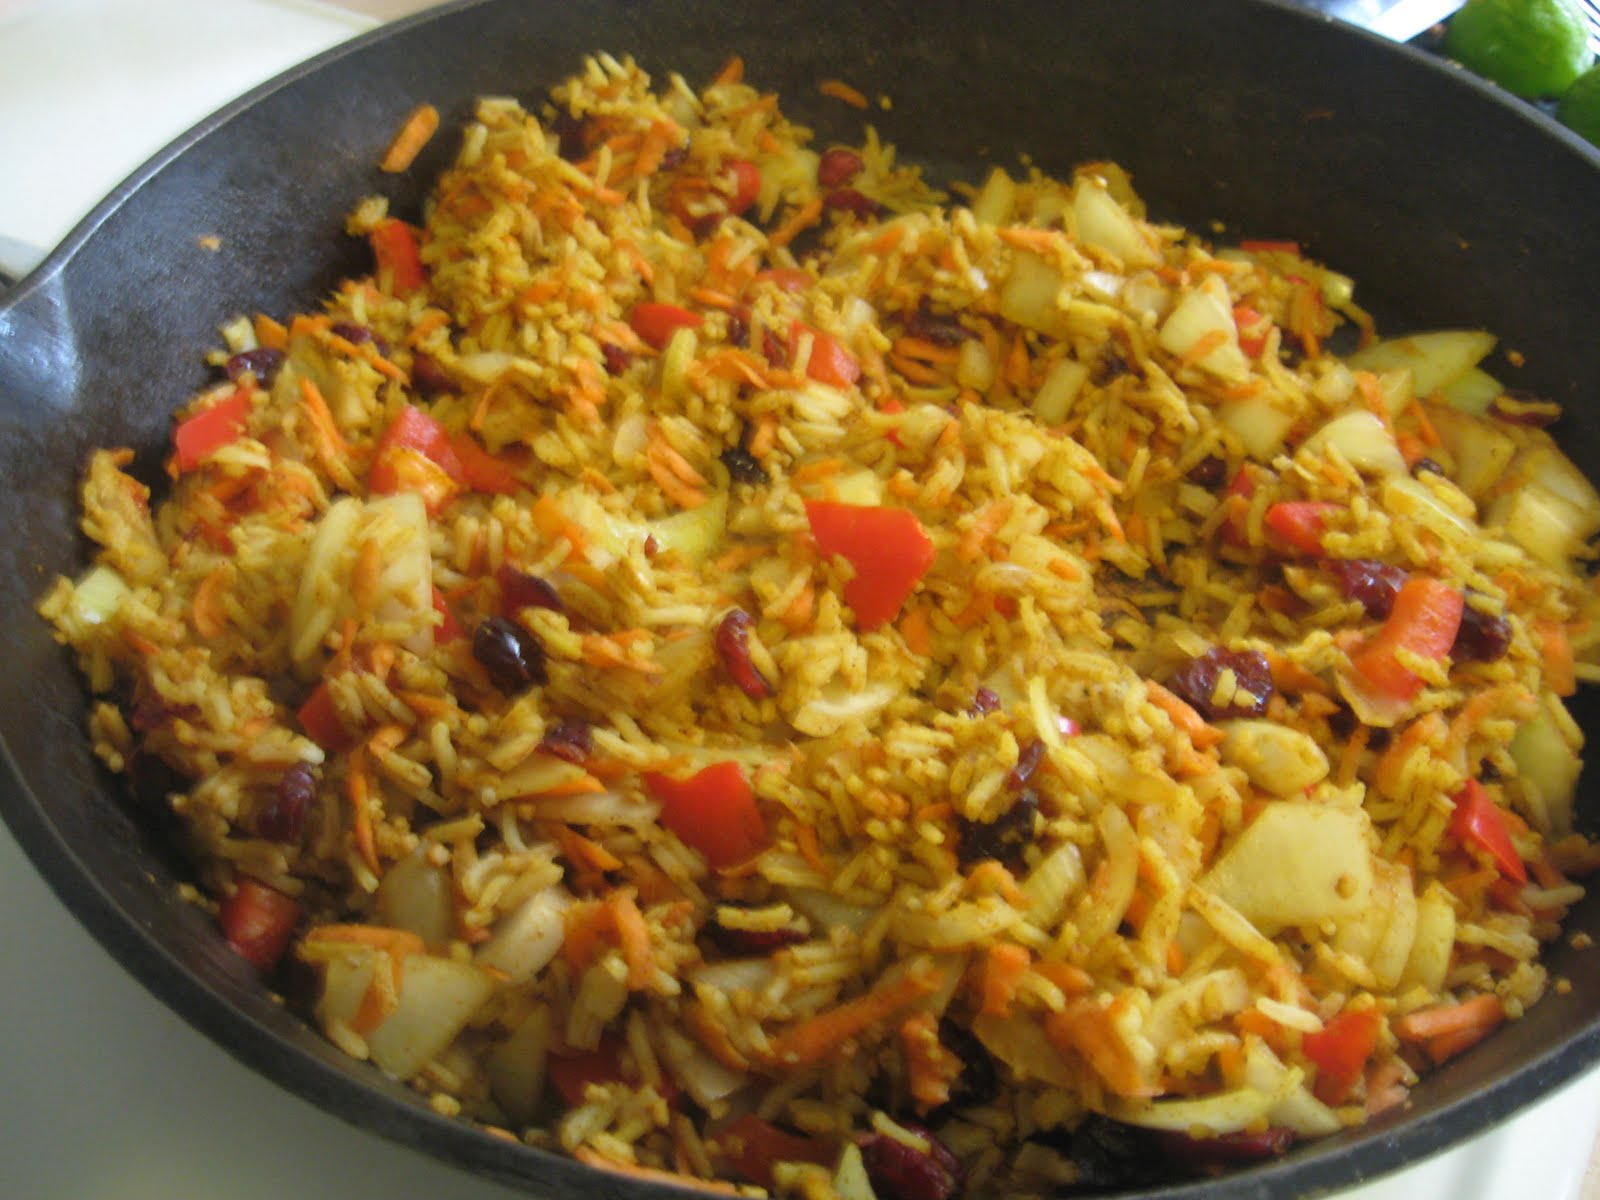 Nannykim's Recipes: Kazakhstan Type Spicy Rice Or Uzbek Palov